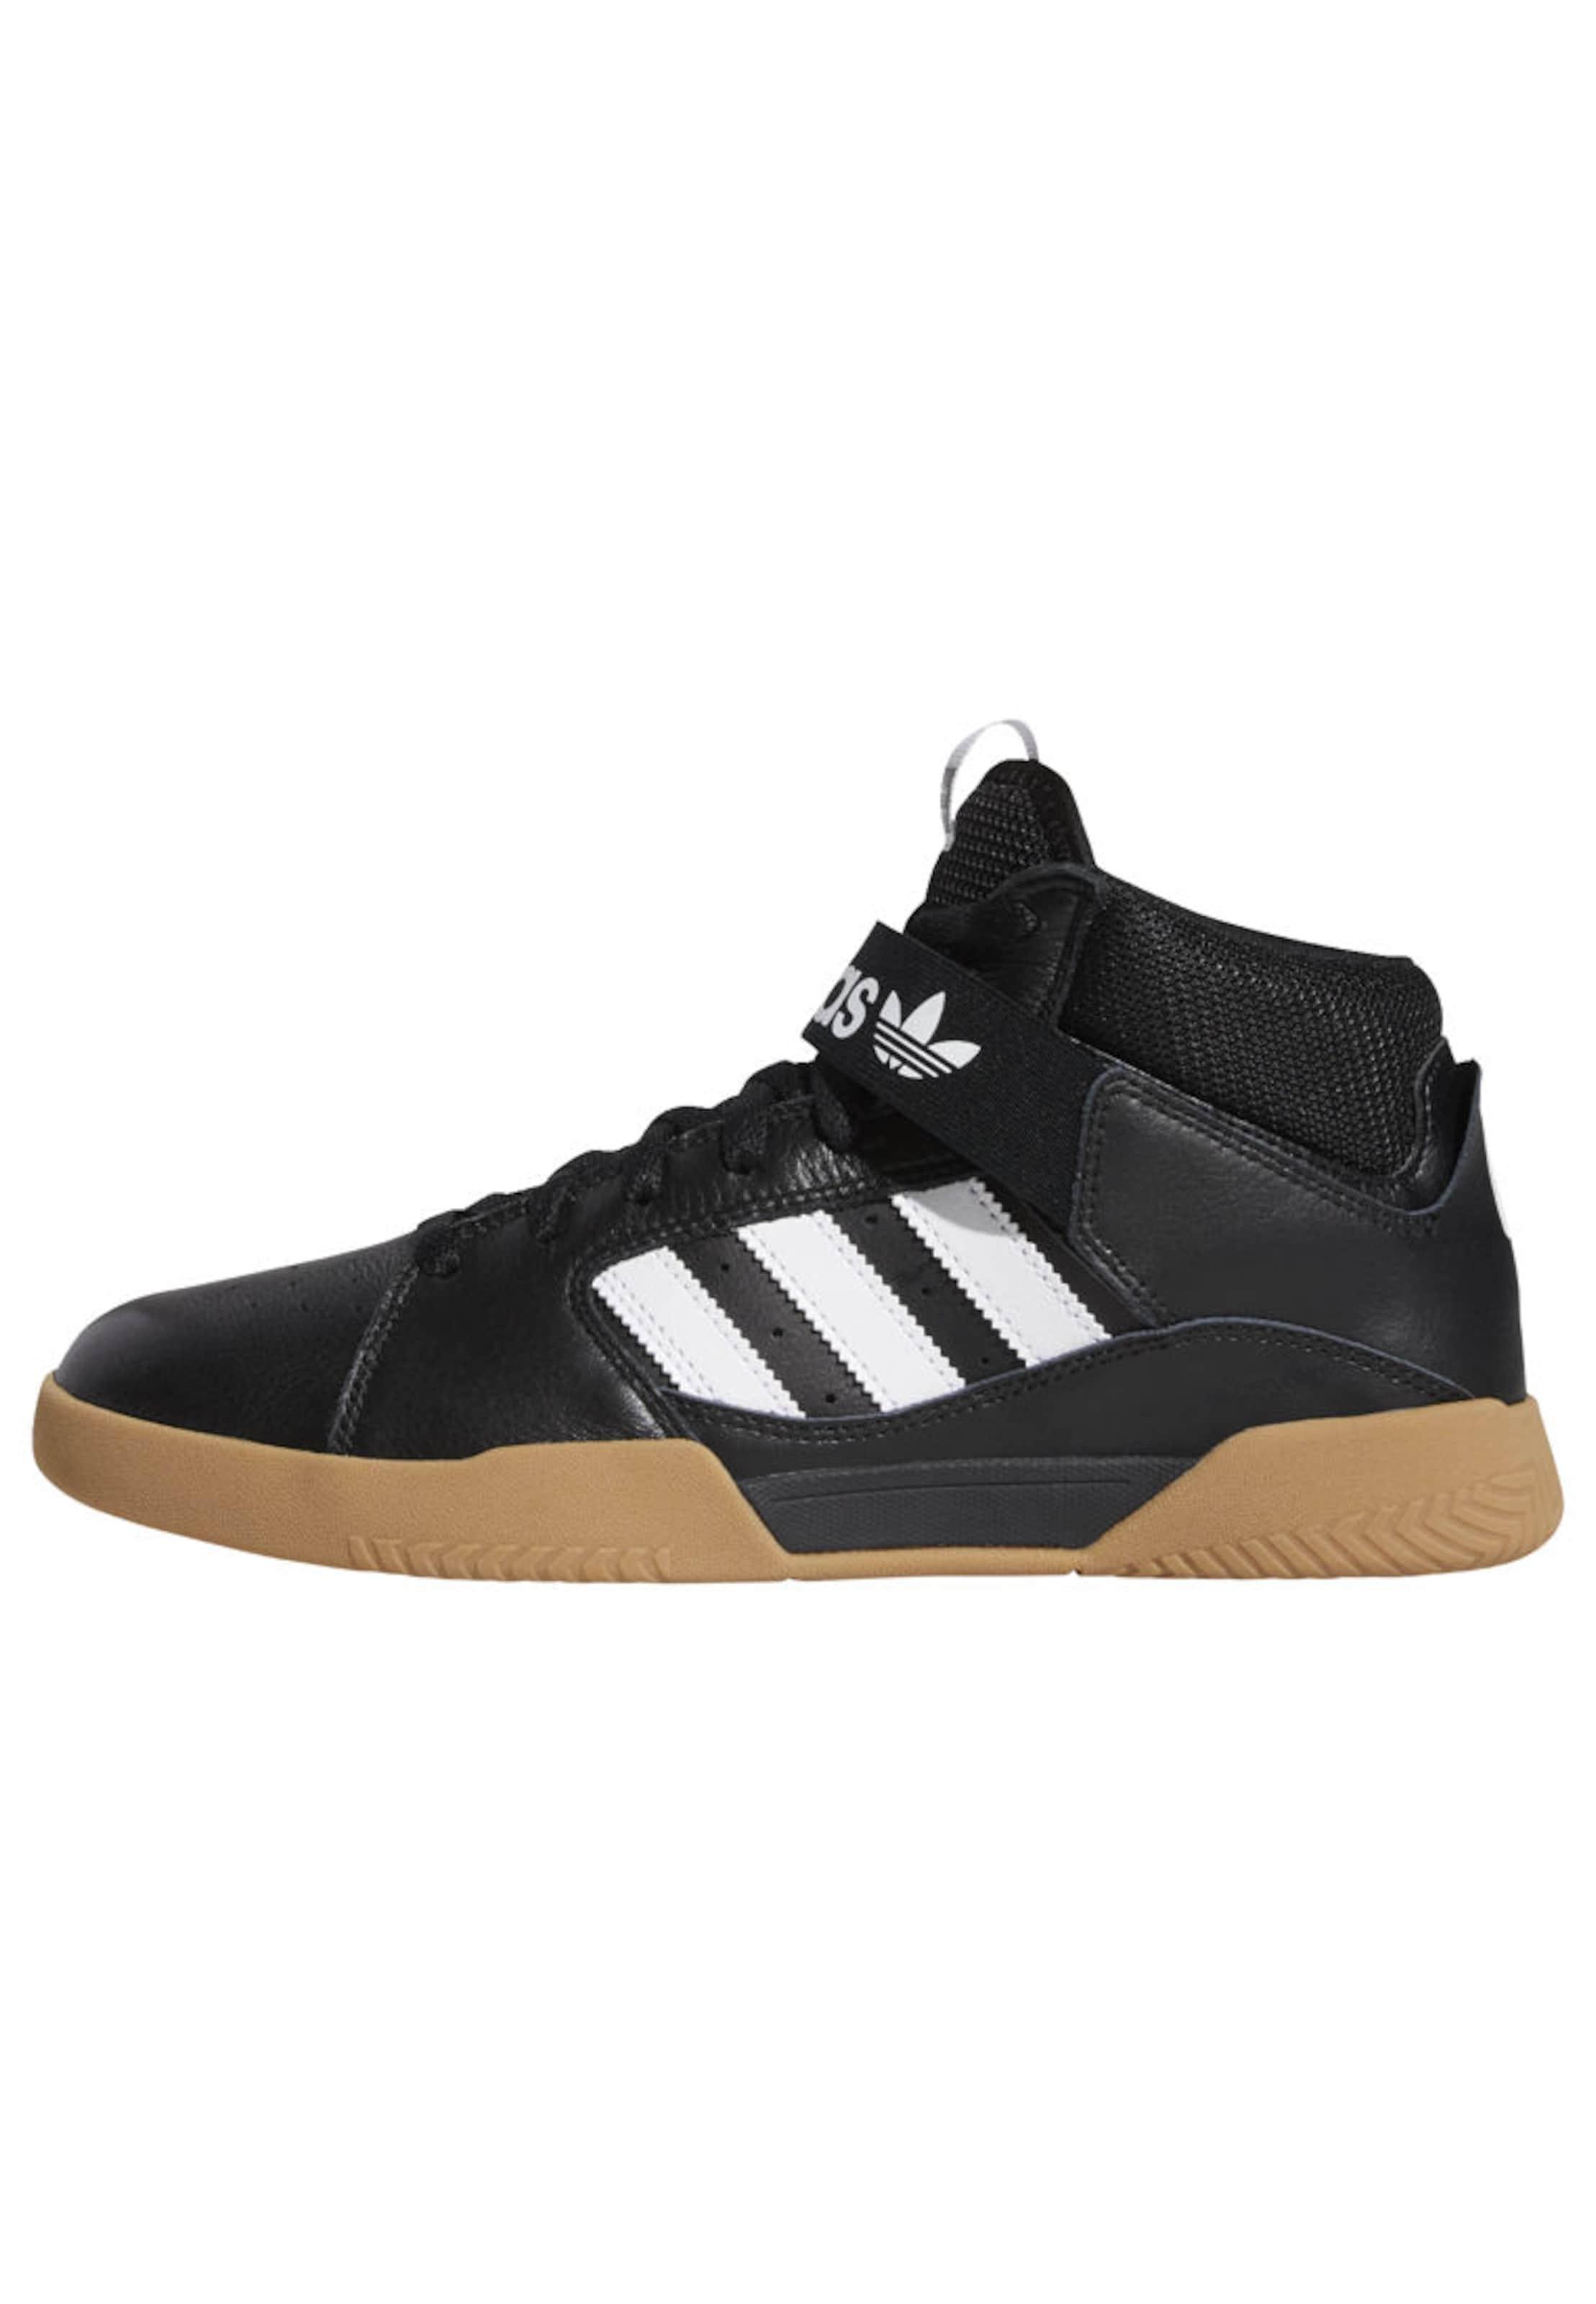 Sneaker Adidas Adidas Originals Sneaker In In Schwarz Originals Schwarz byv6gfIY7m